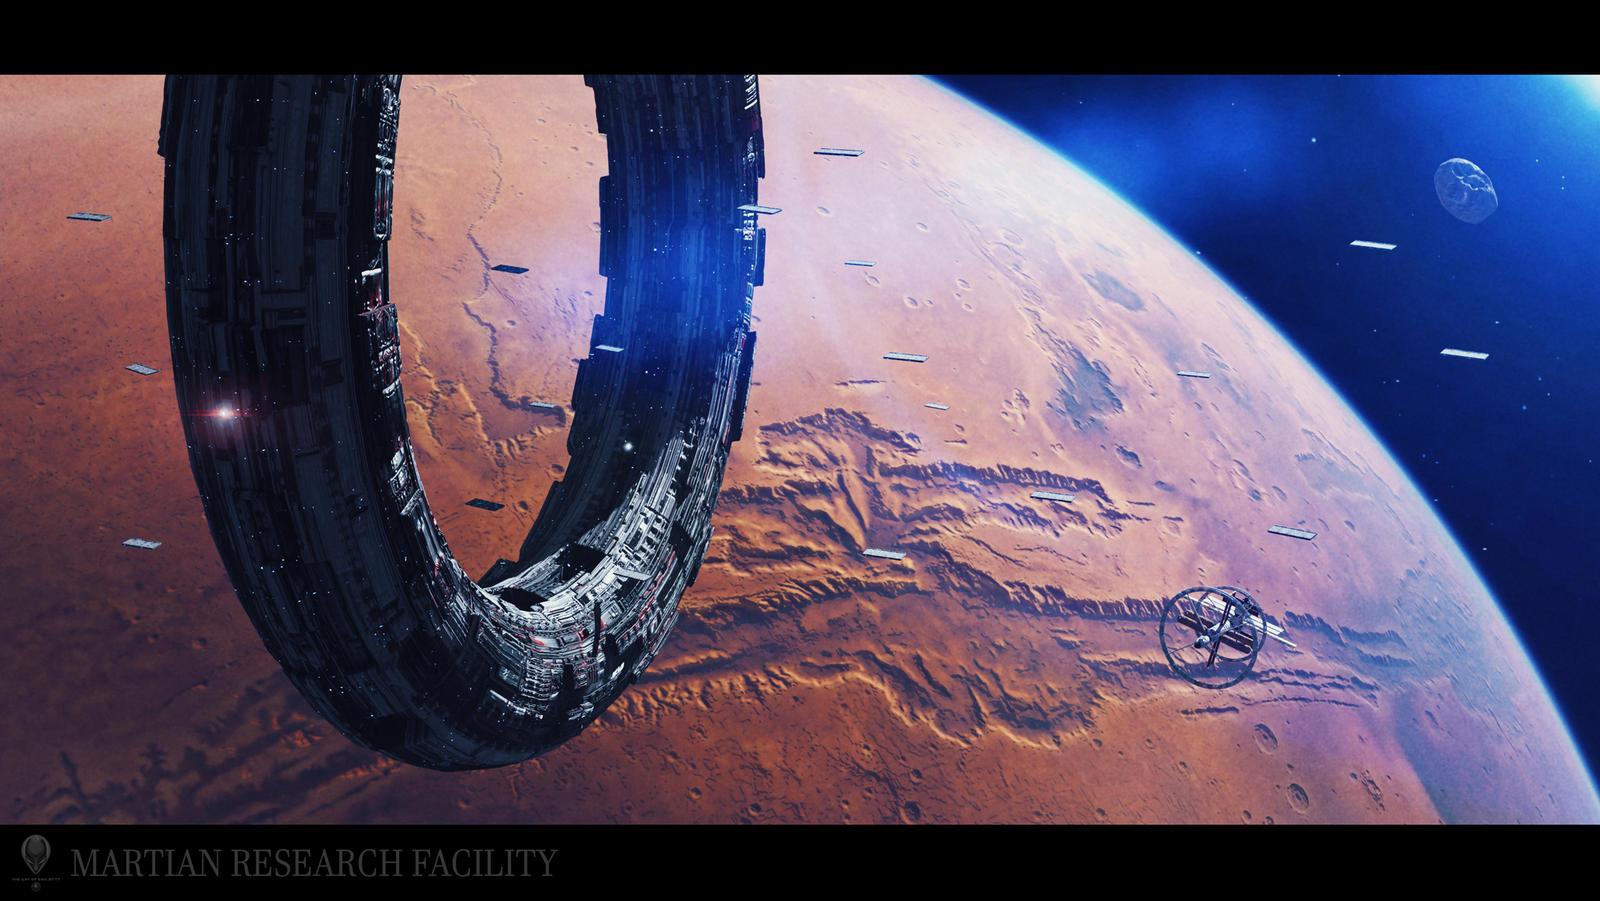 Martian Research Facility